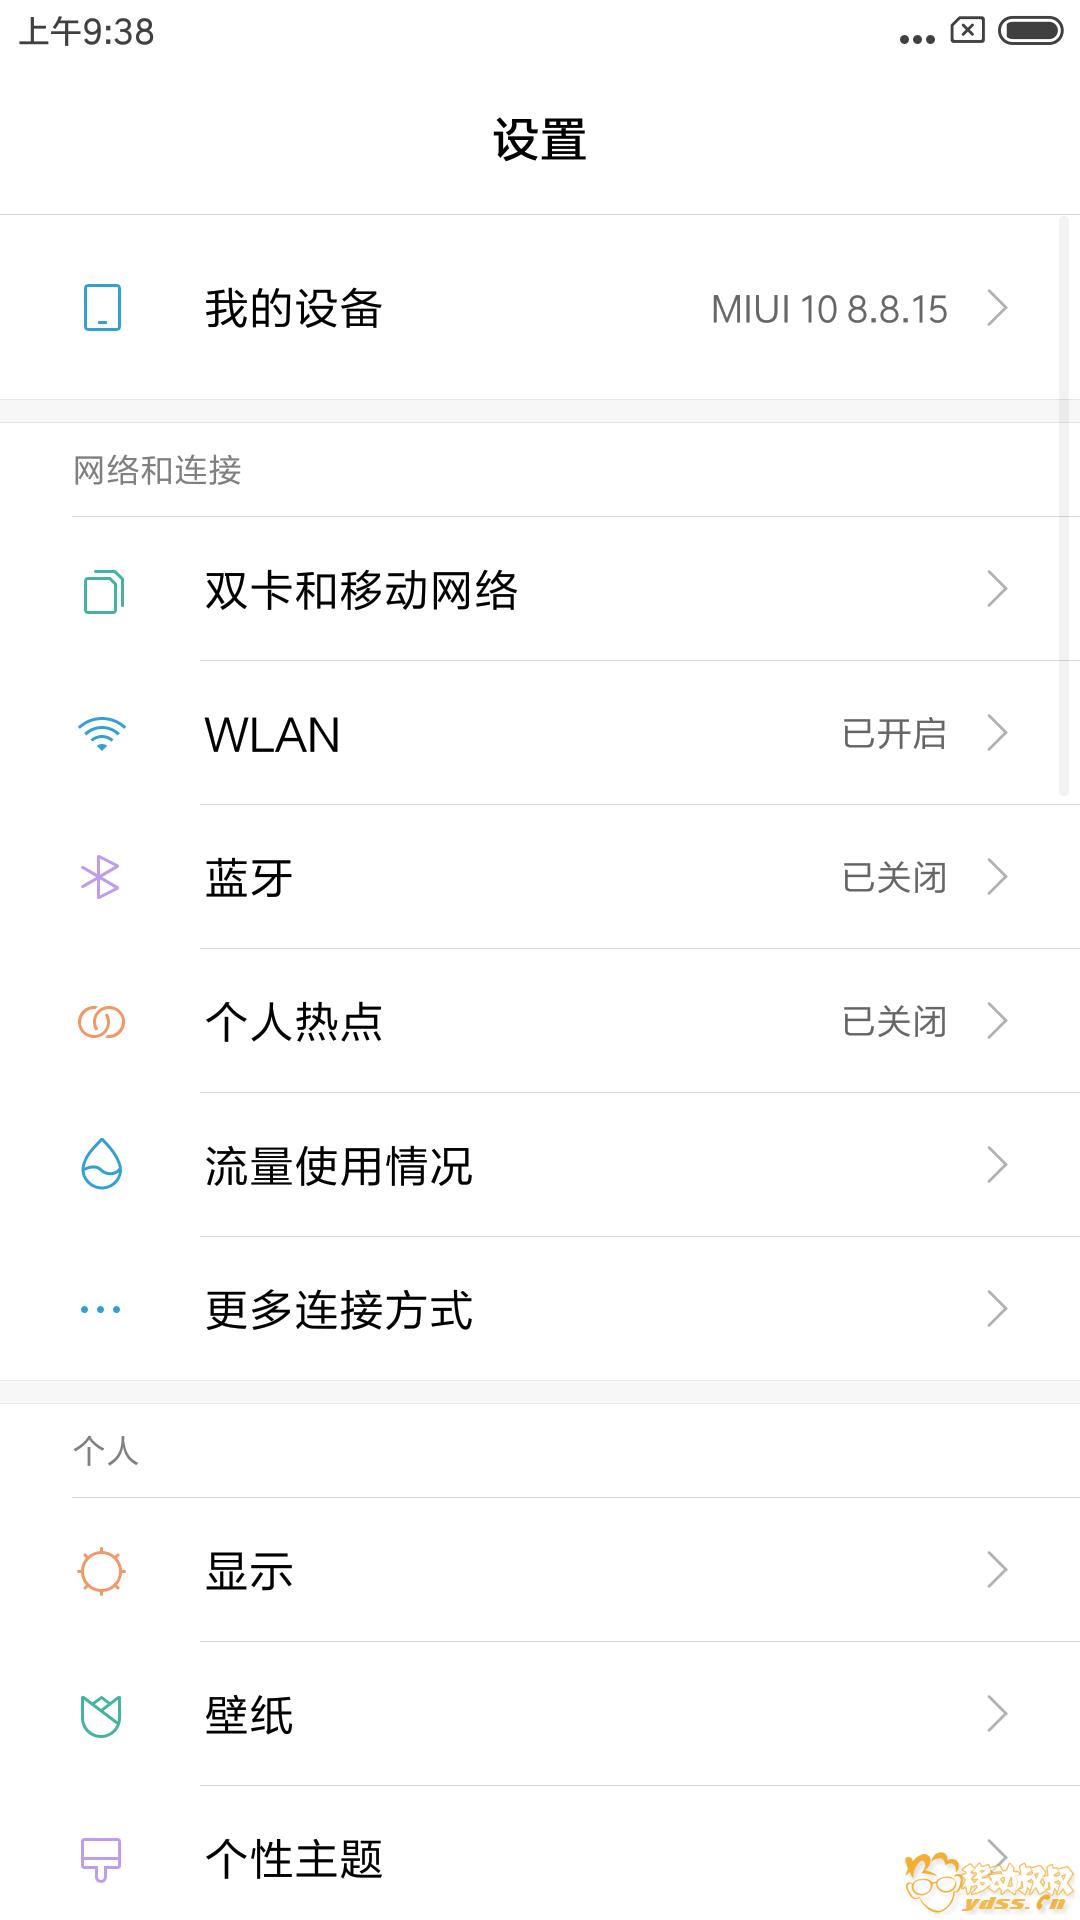 Screenshot_2018-08-15-09-38-07-195_com.android.settings.png